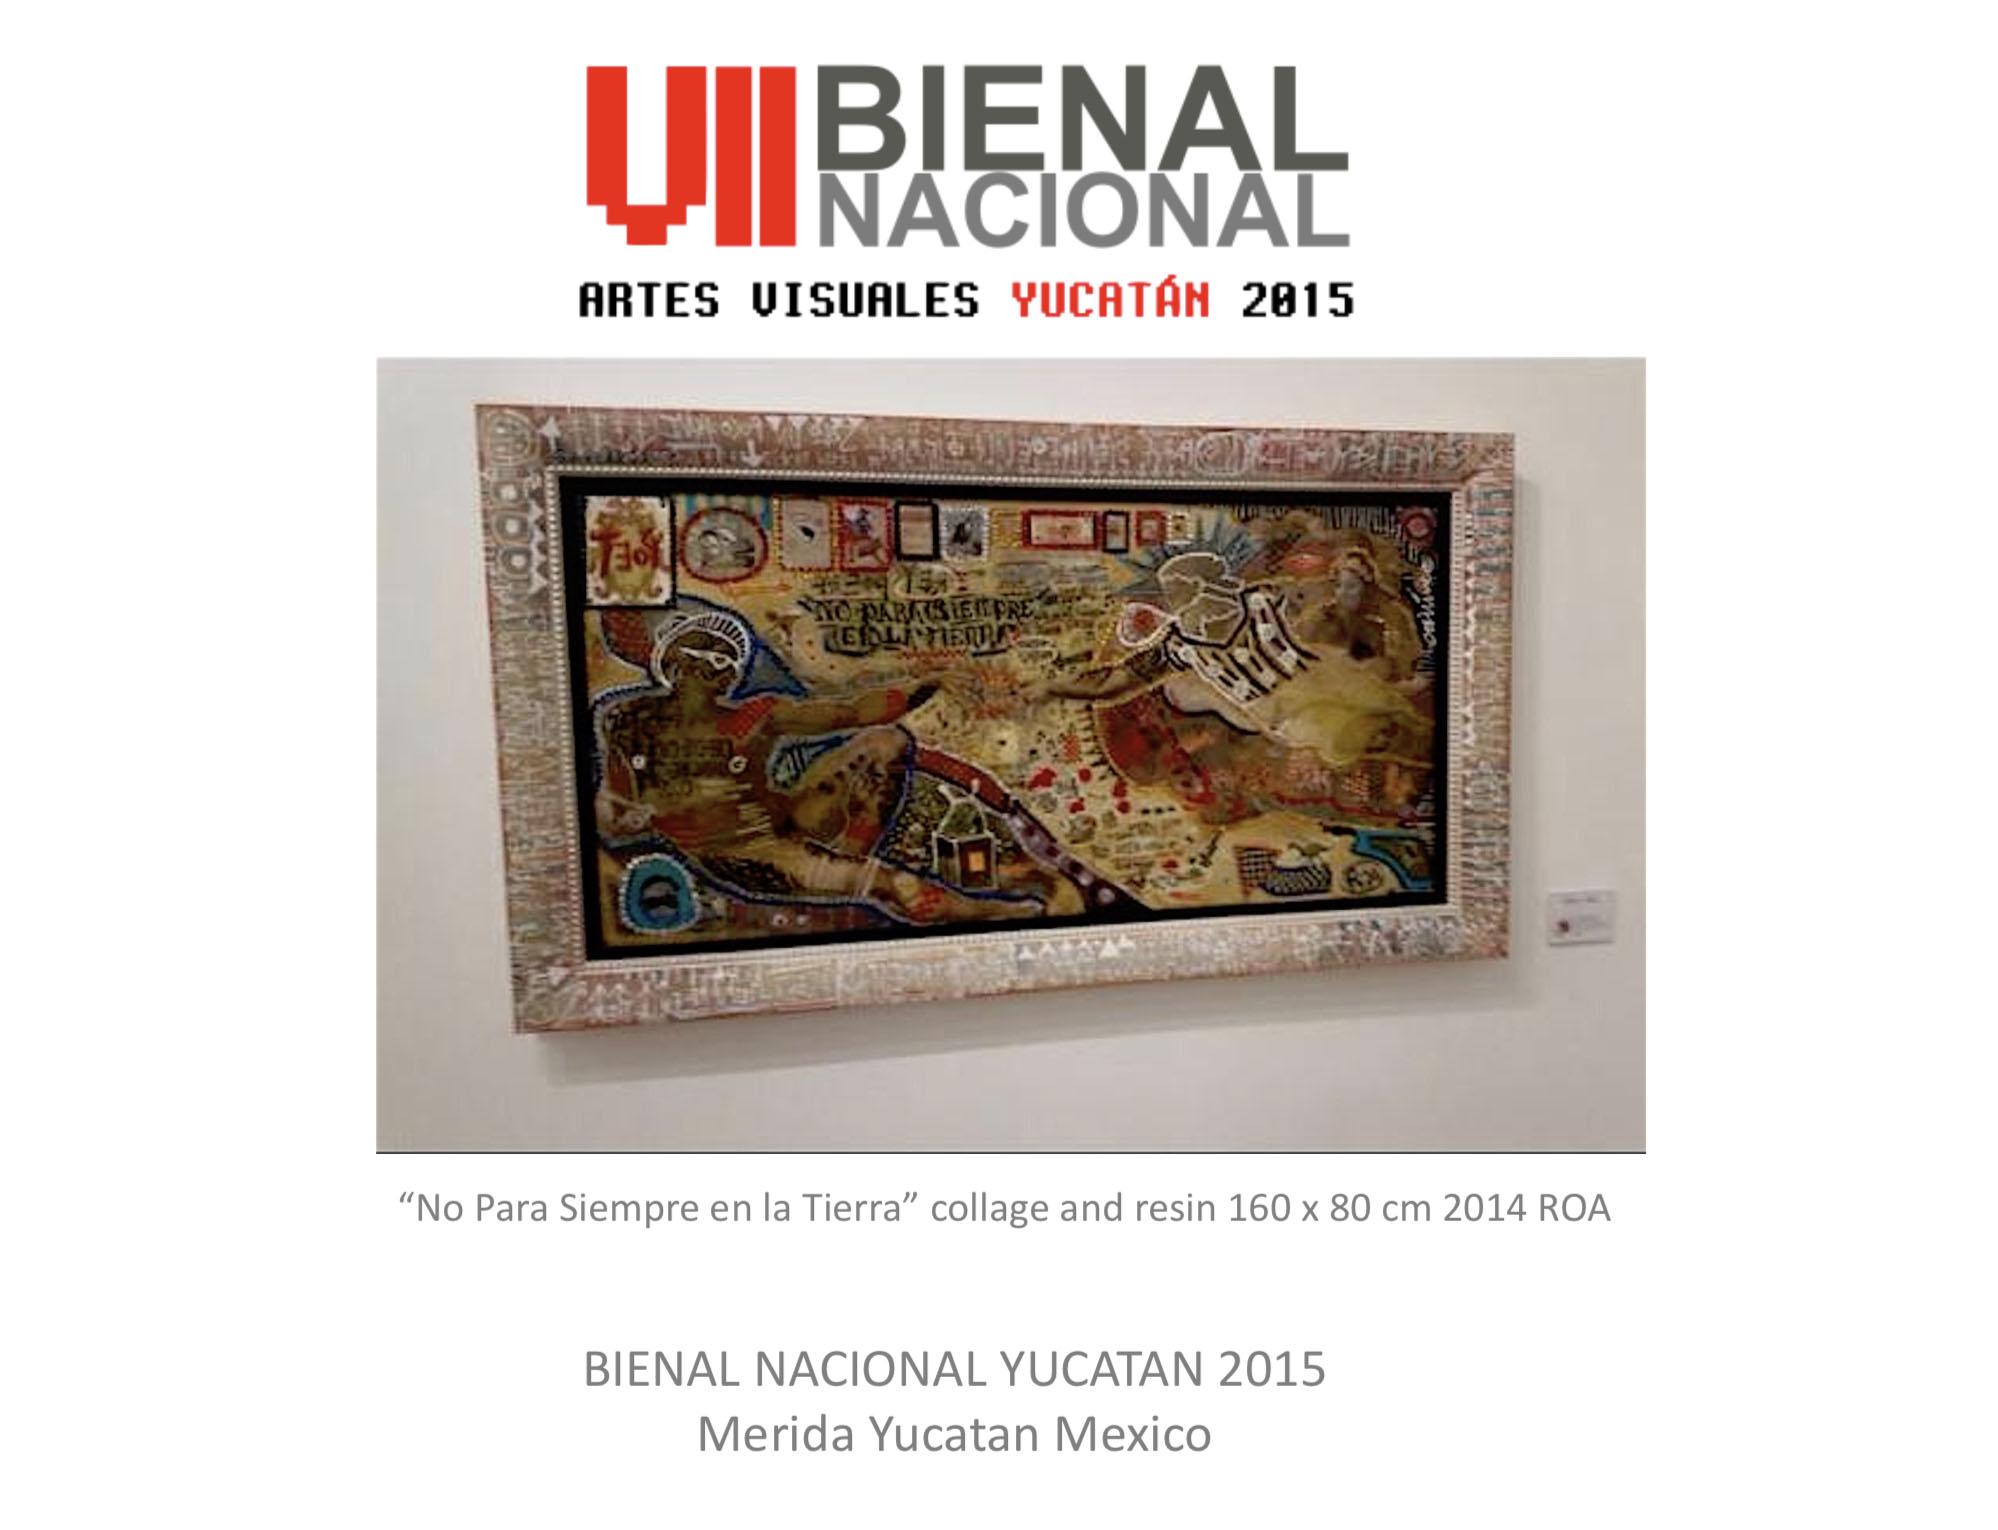 Jacobo Roa Manos Bienal 1.jpg